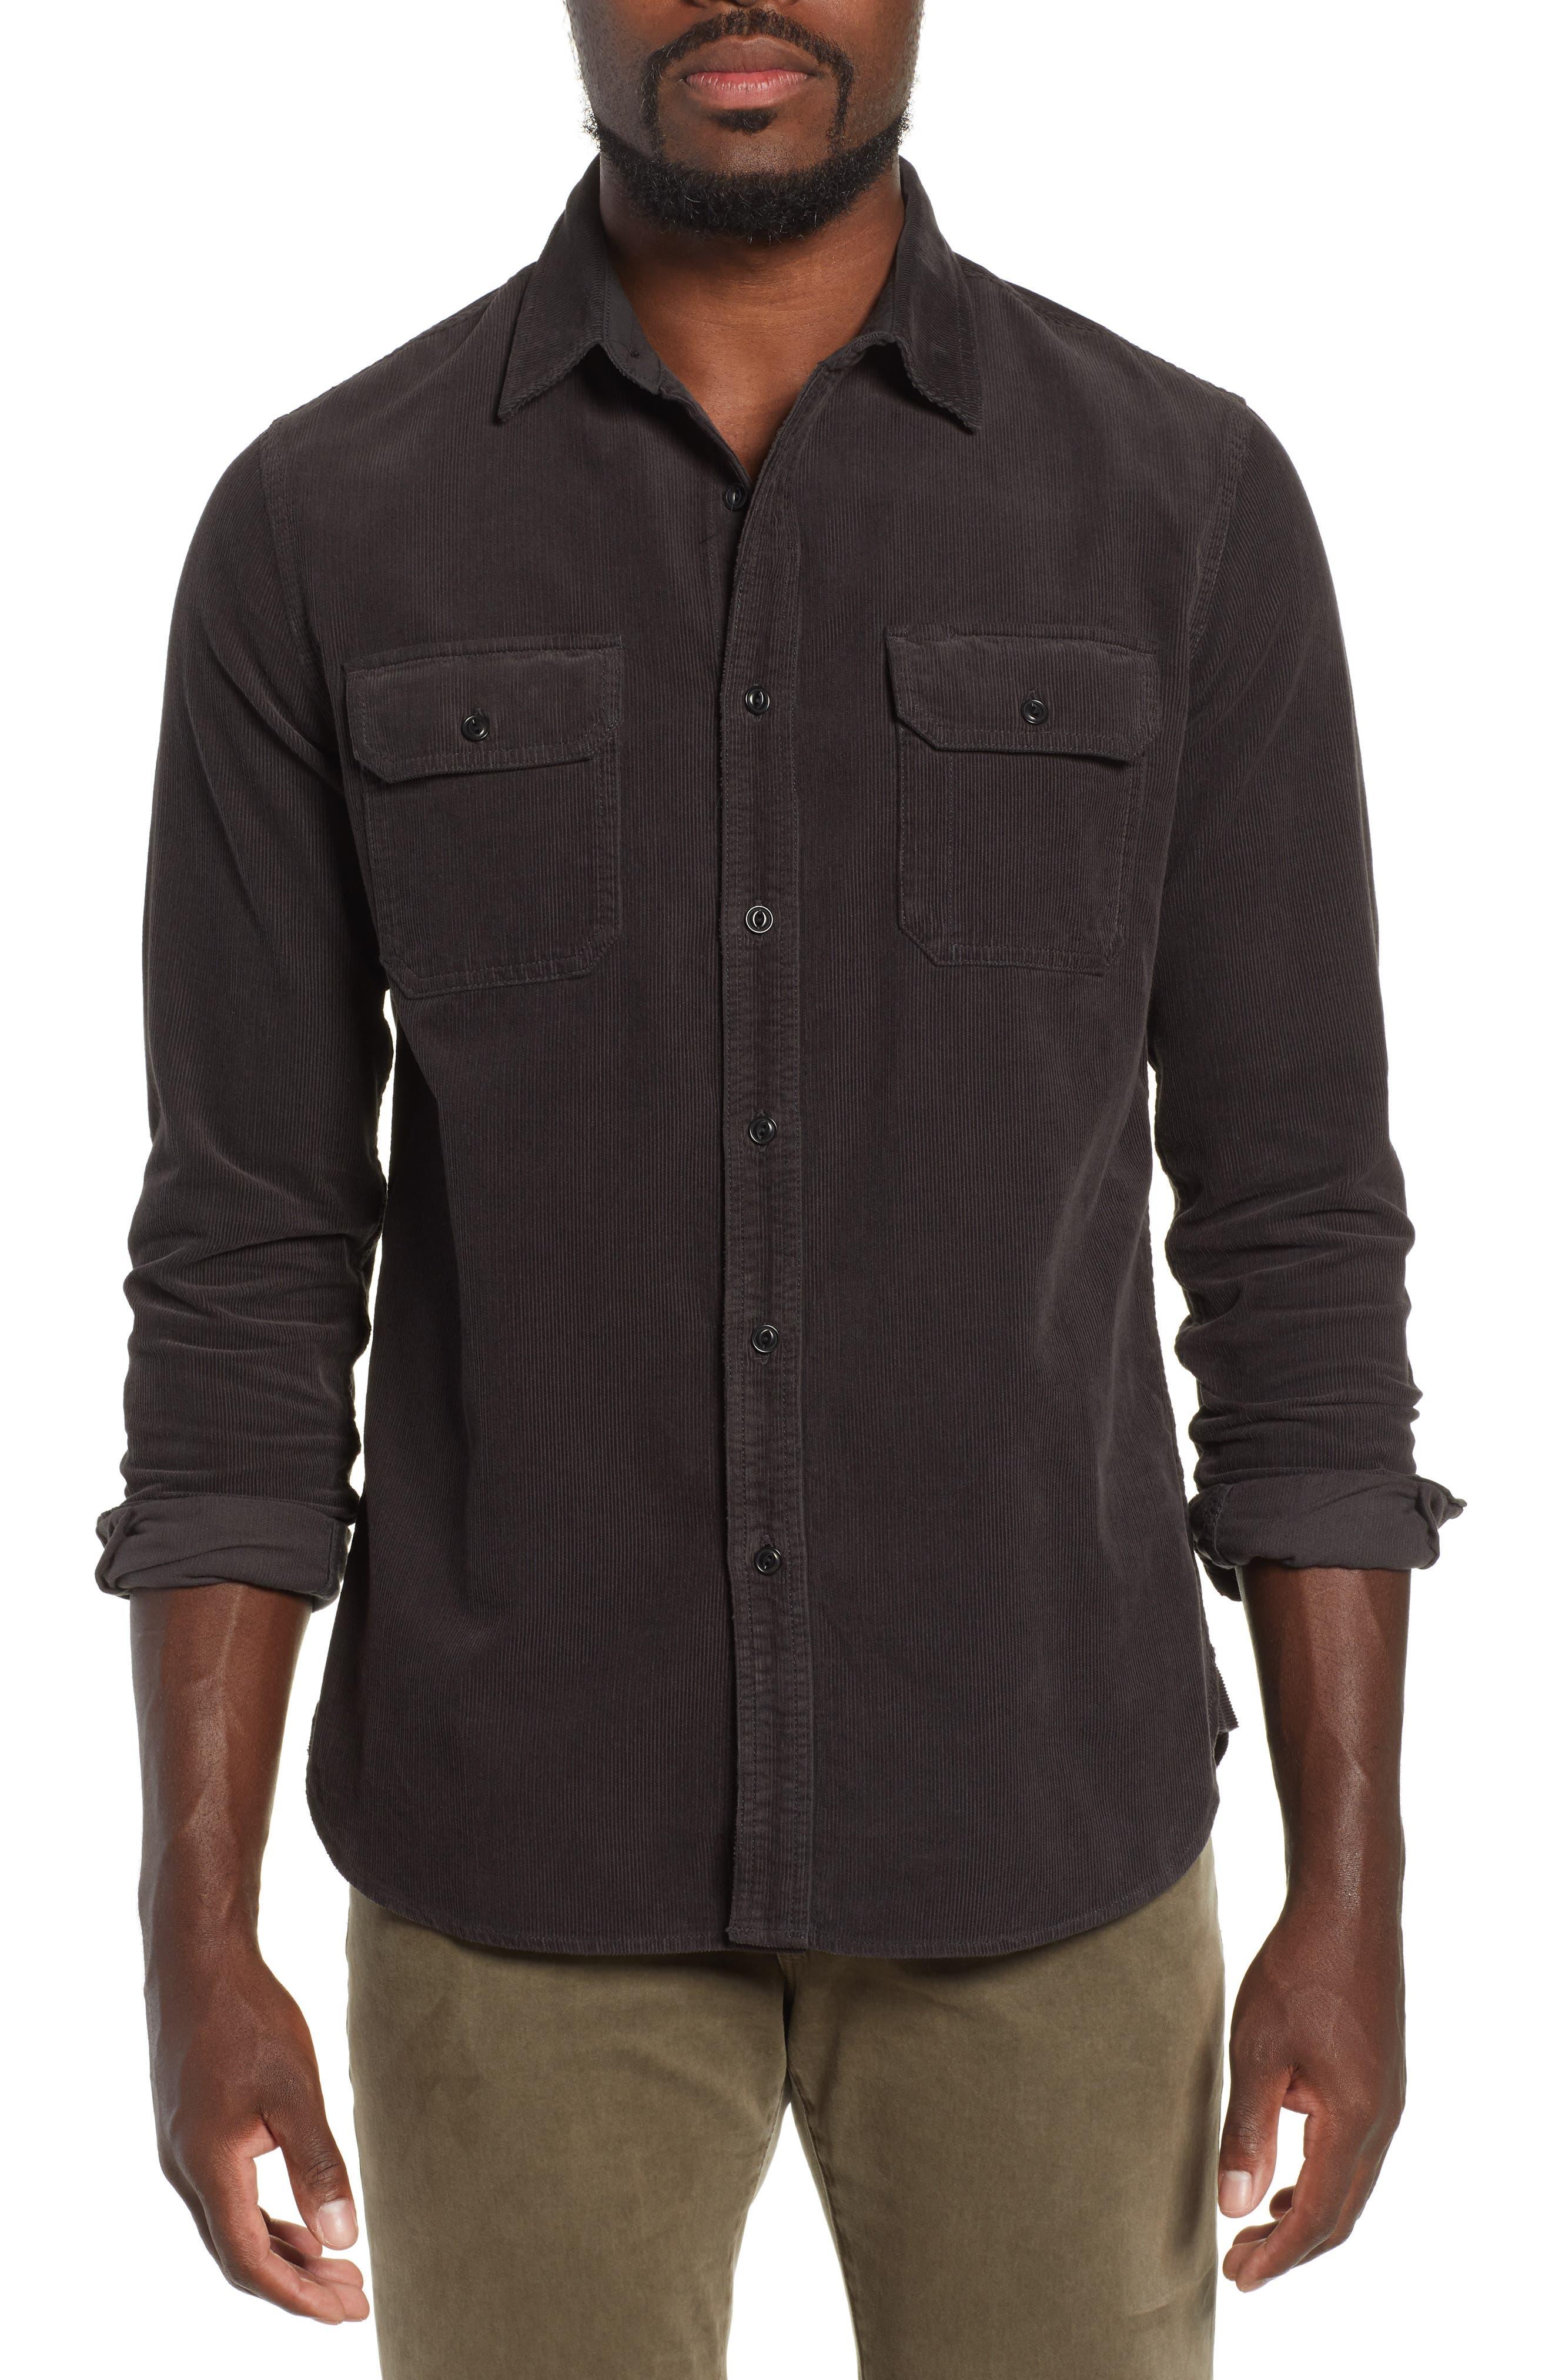 Benning Slim Fit Utility Shirt,                             Main thumbnail 1, color,                             GRAY STONE